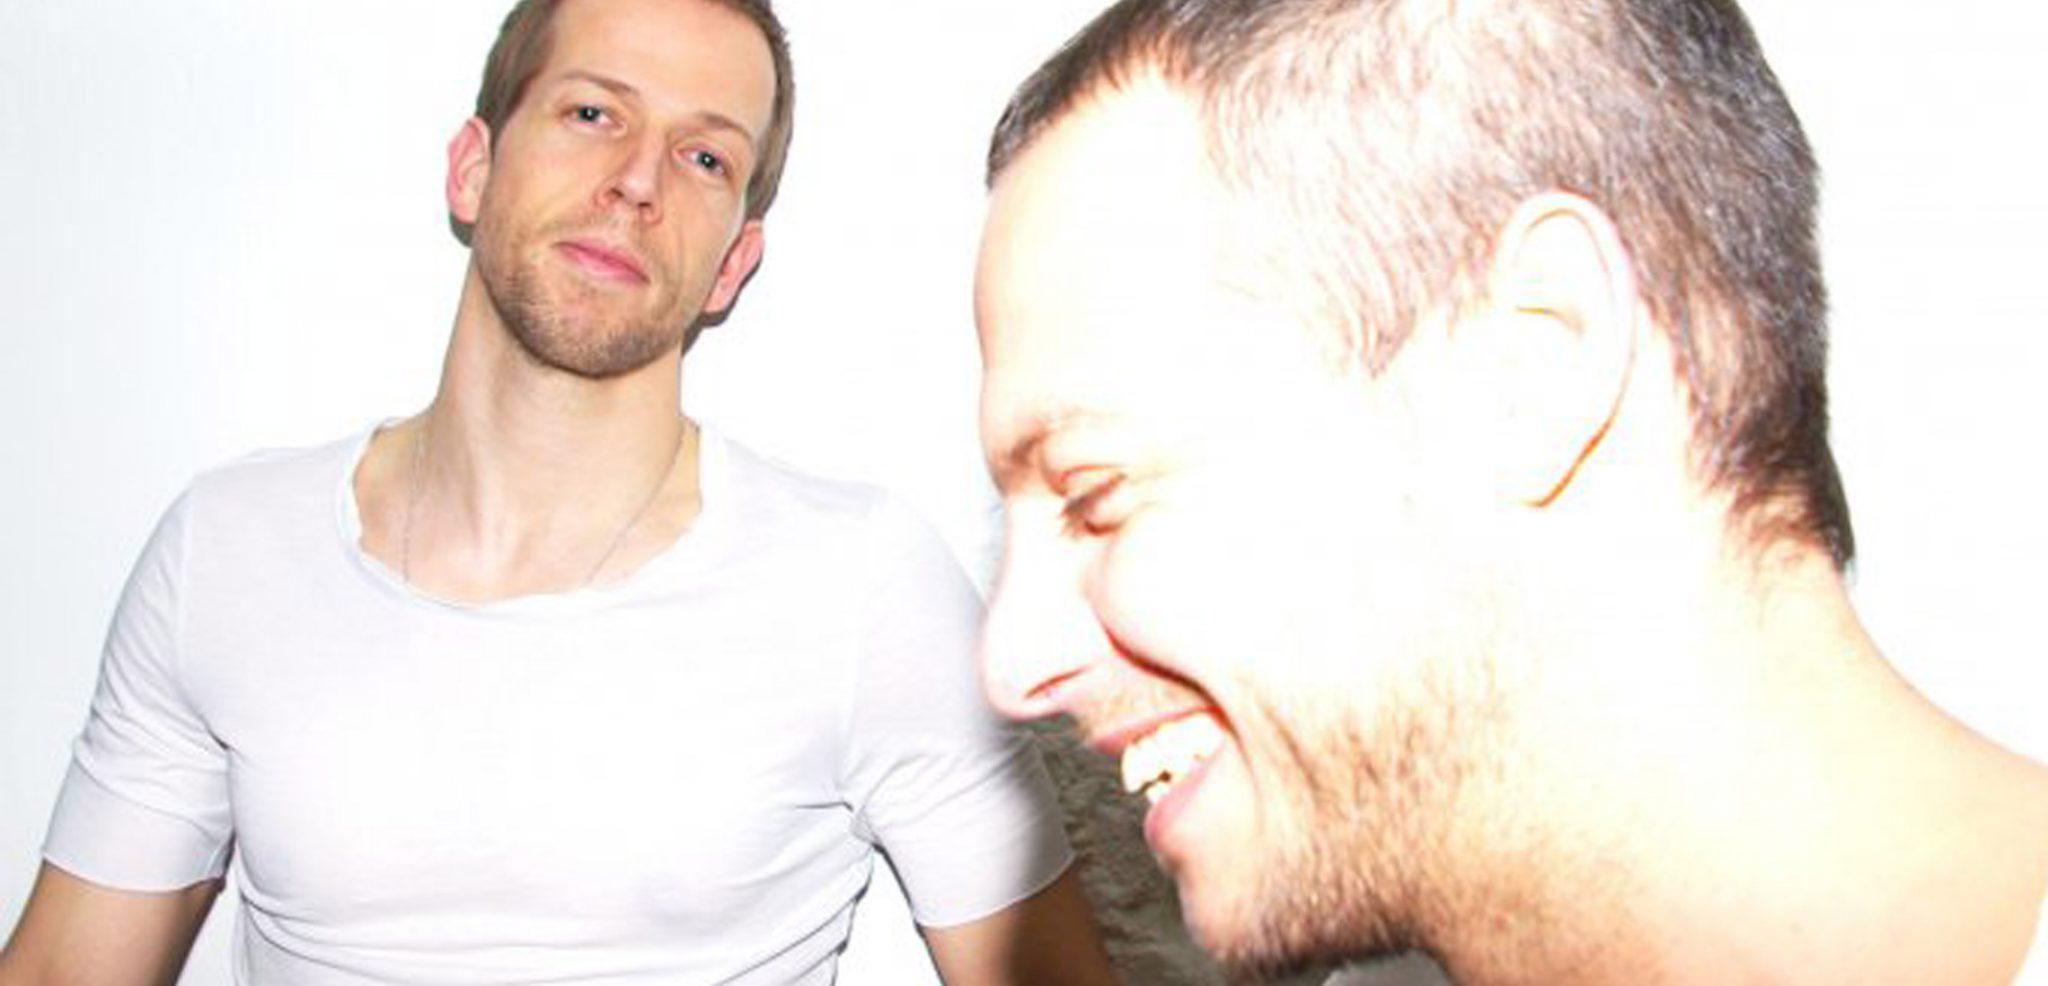 Superlounge - All On Me EP (incl Eric Volta, Maher Daniel and Hands Free & Kosmas remixes) hero